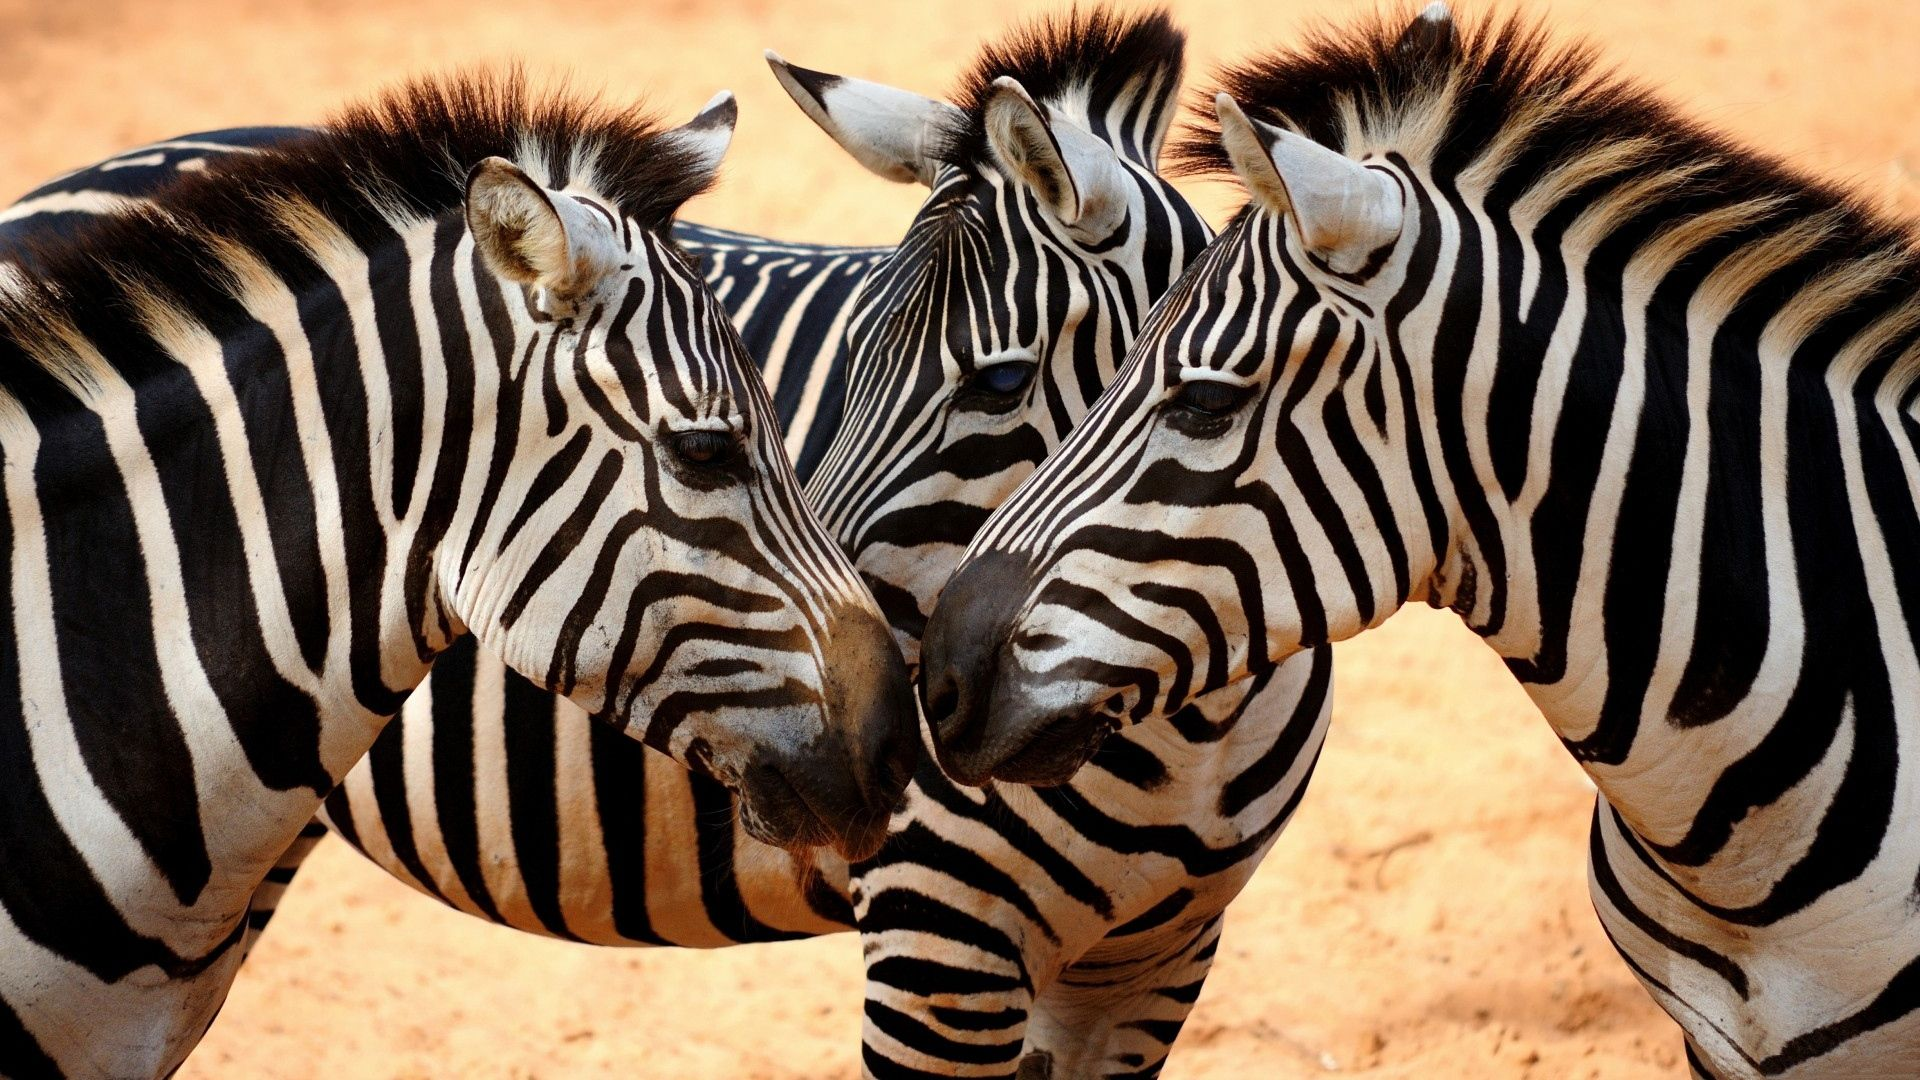 Zebra Animal Photos